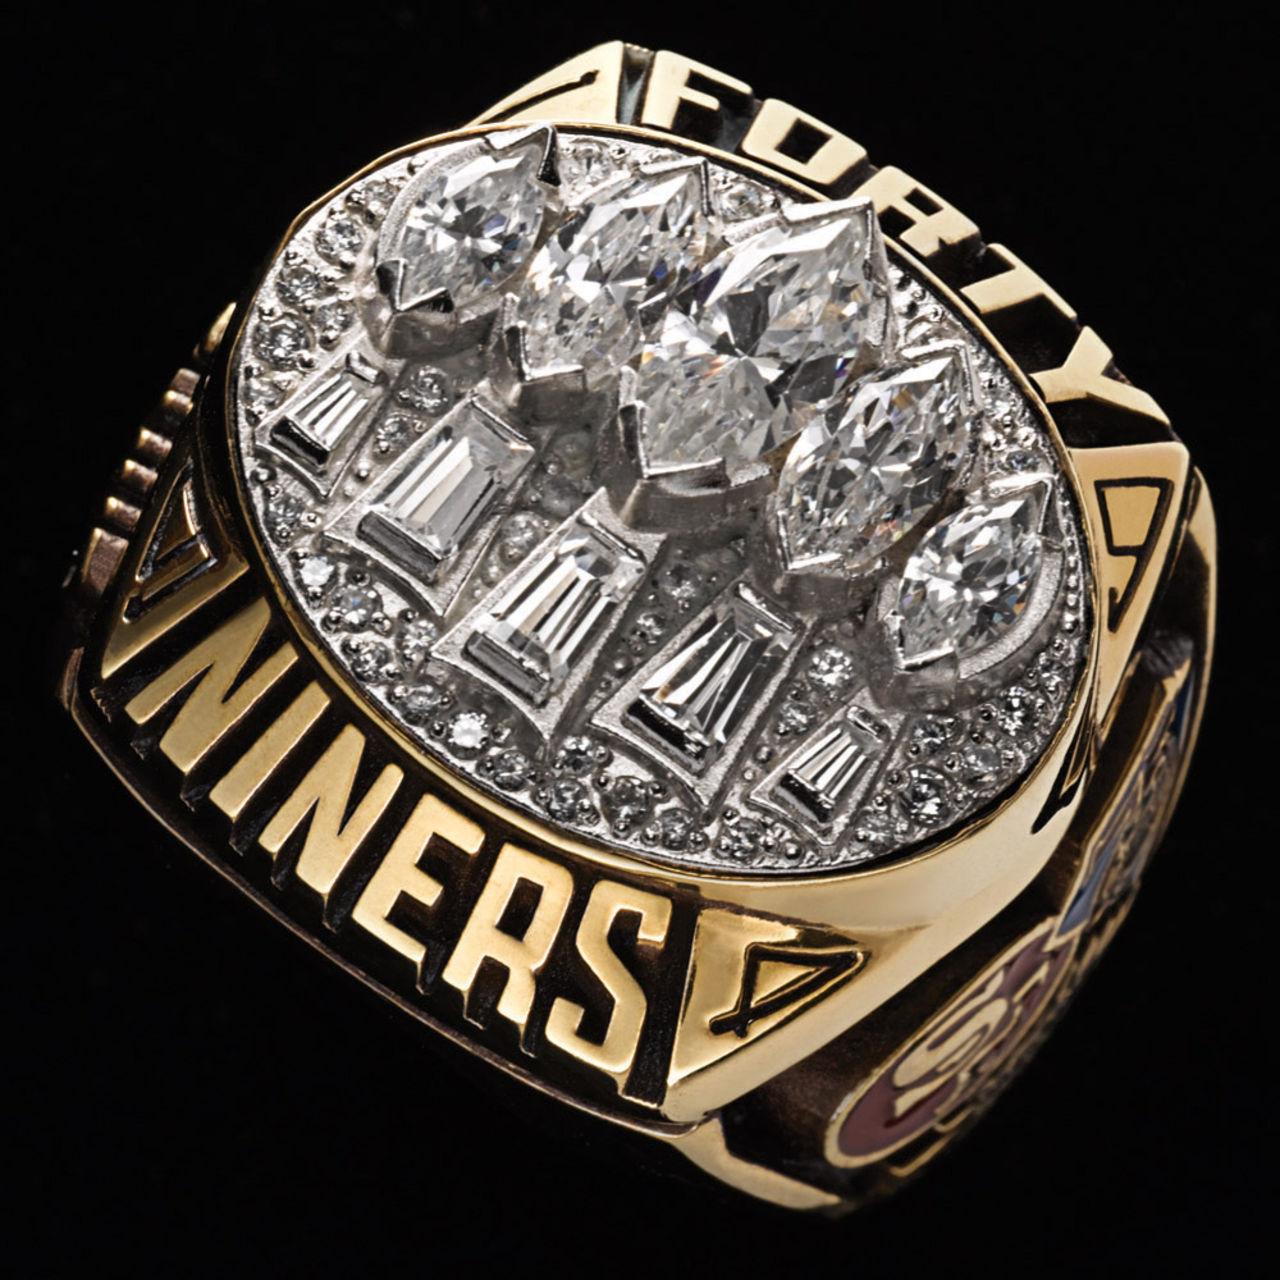 San Francisco 49ers 1995 champions ring